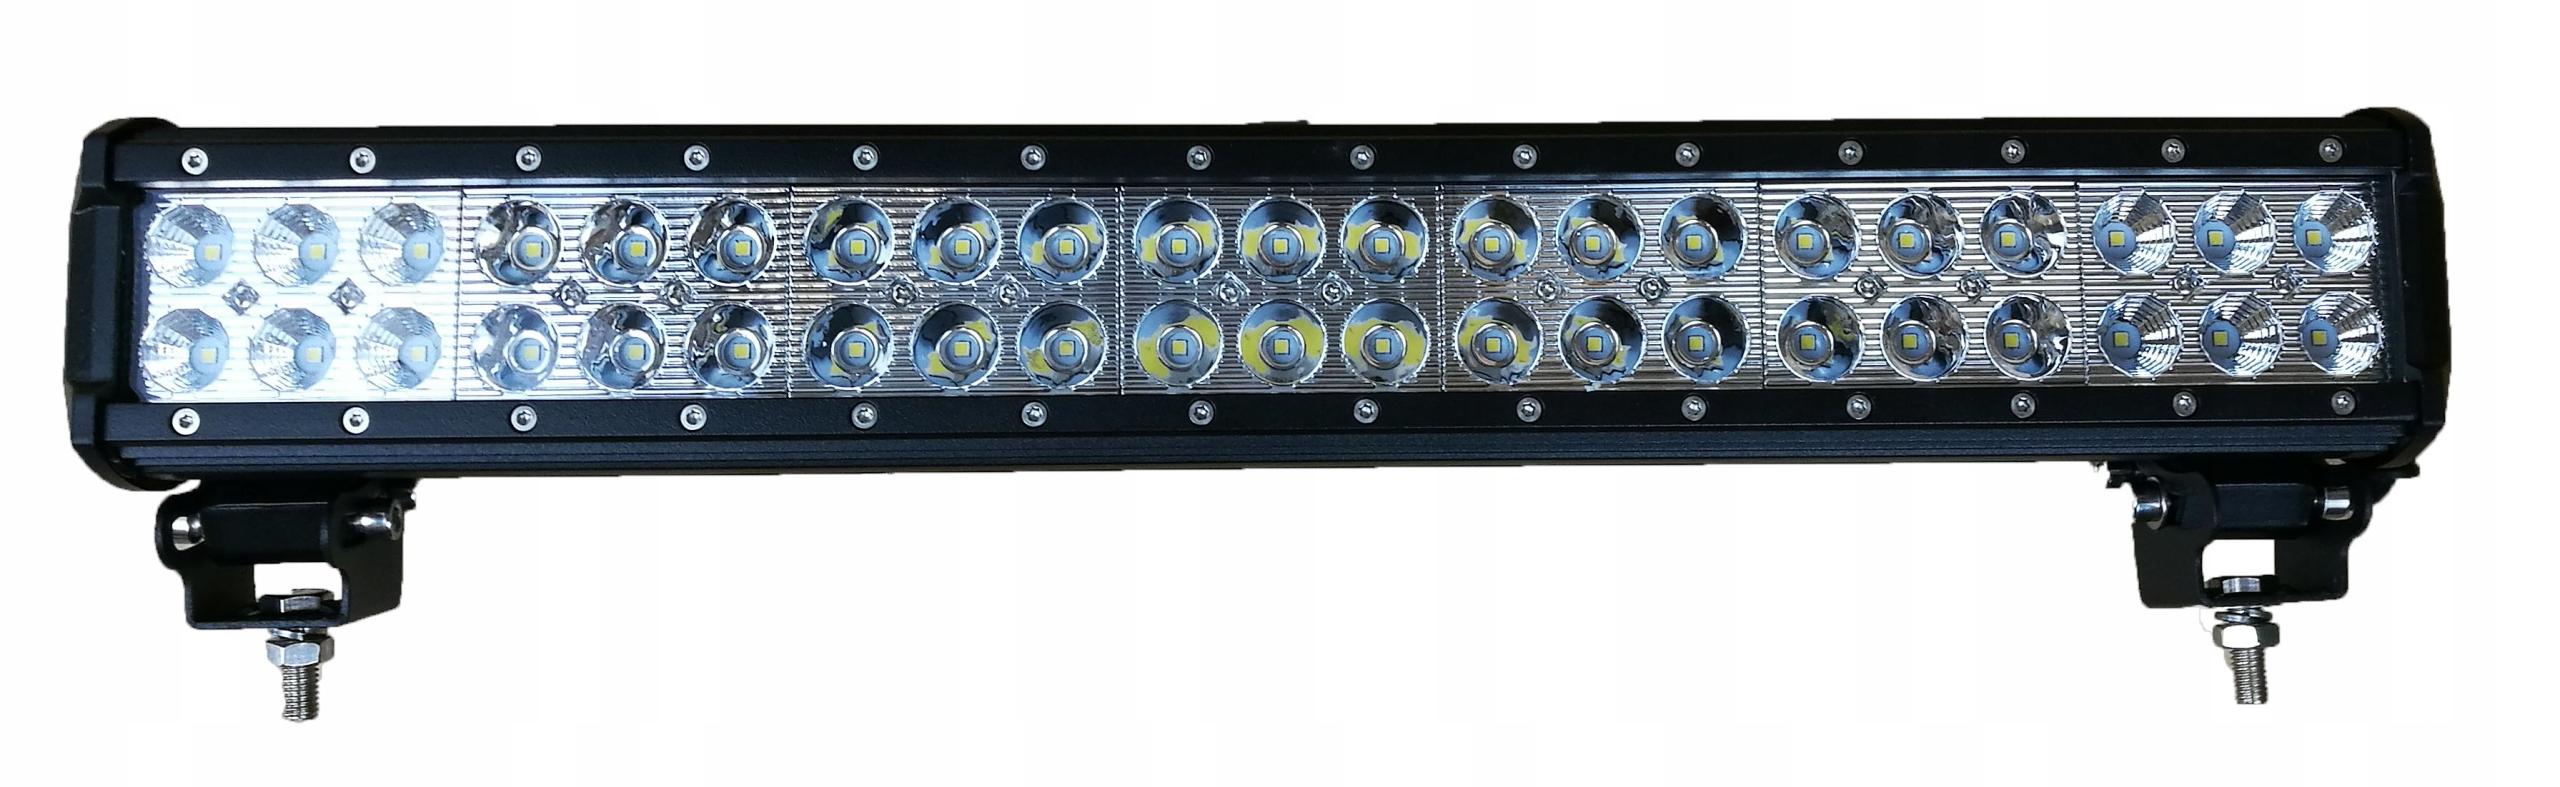 панель led галоген дальнего света планка 126w20' 50cm